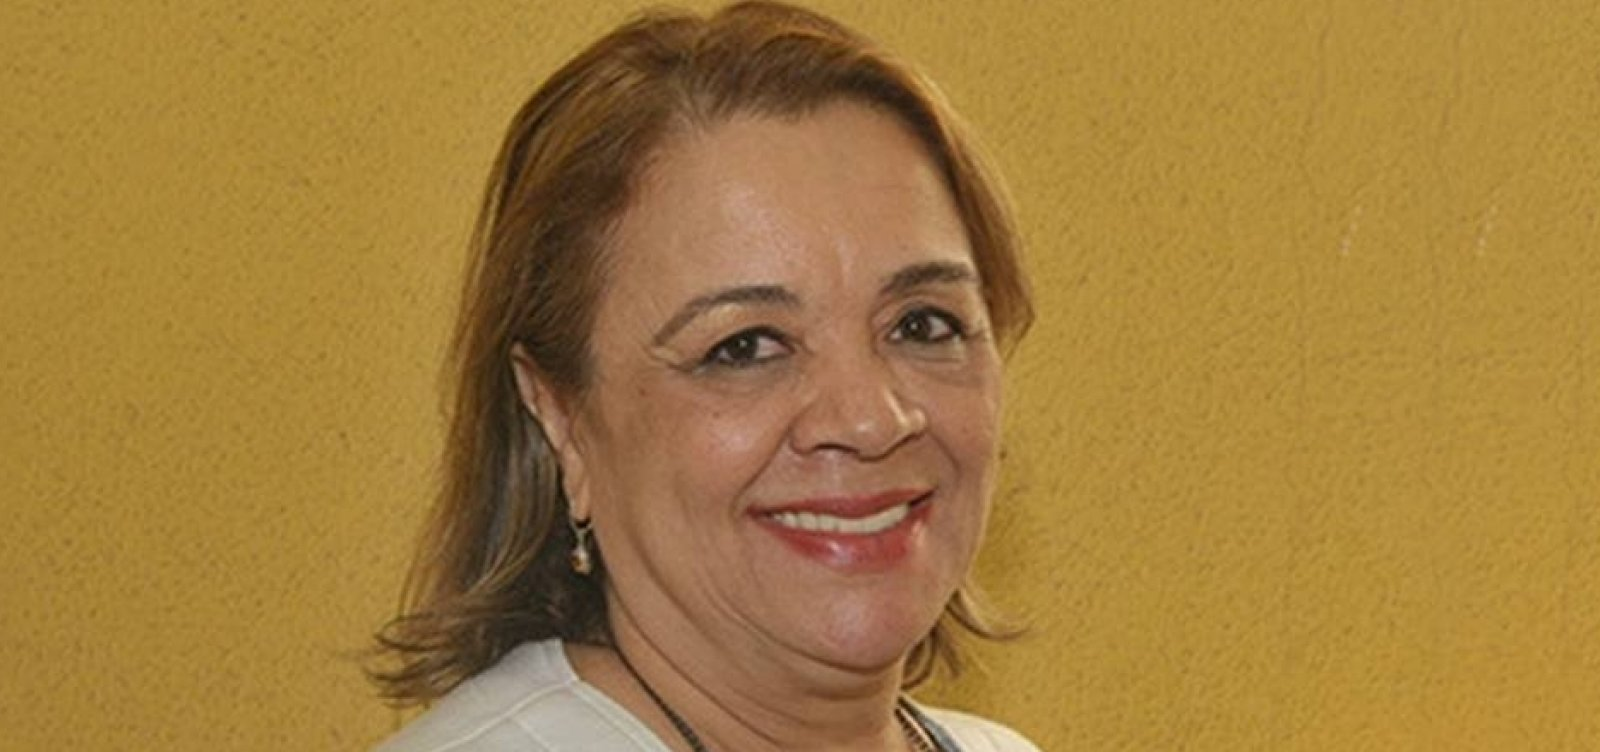 [PF monitorou entrega de R$ 250 mil a desembargadora do TJ da Bahia]